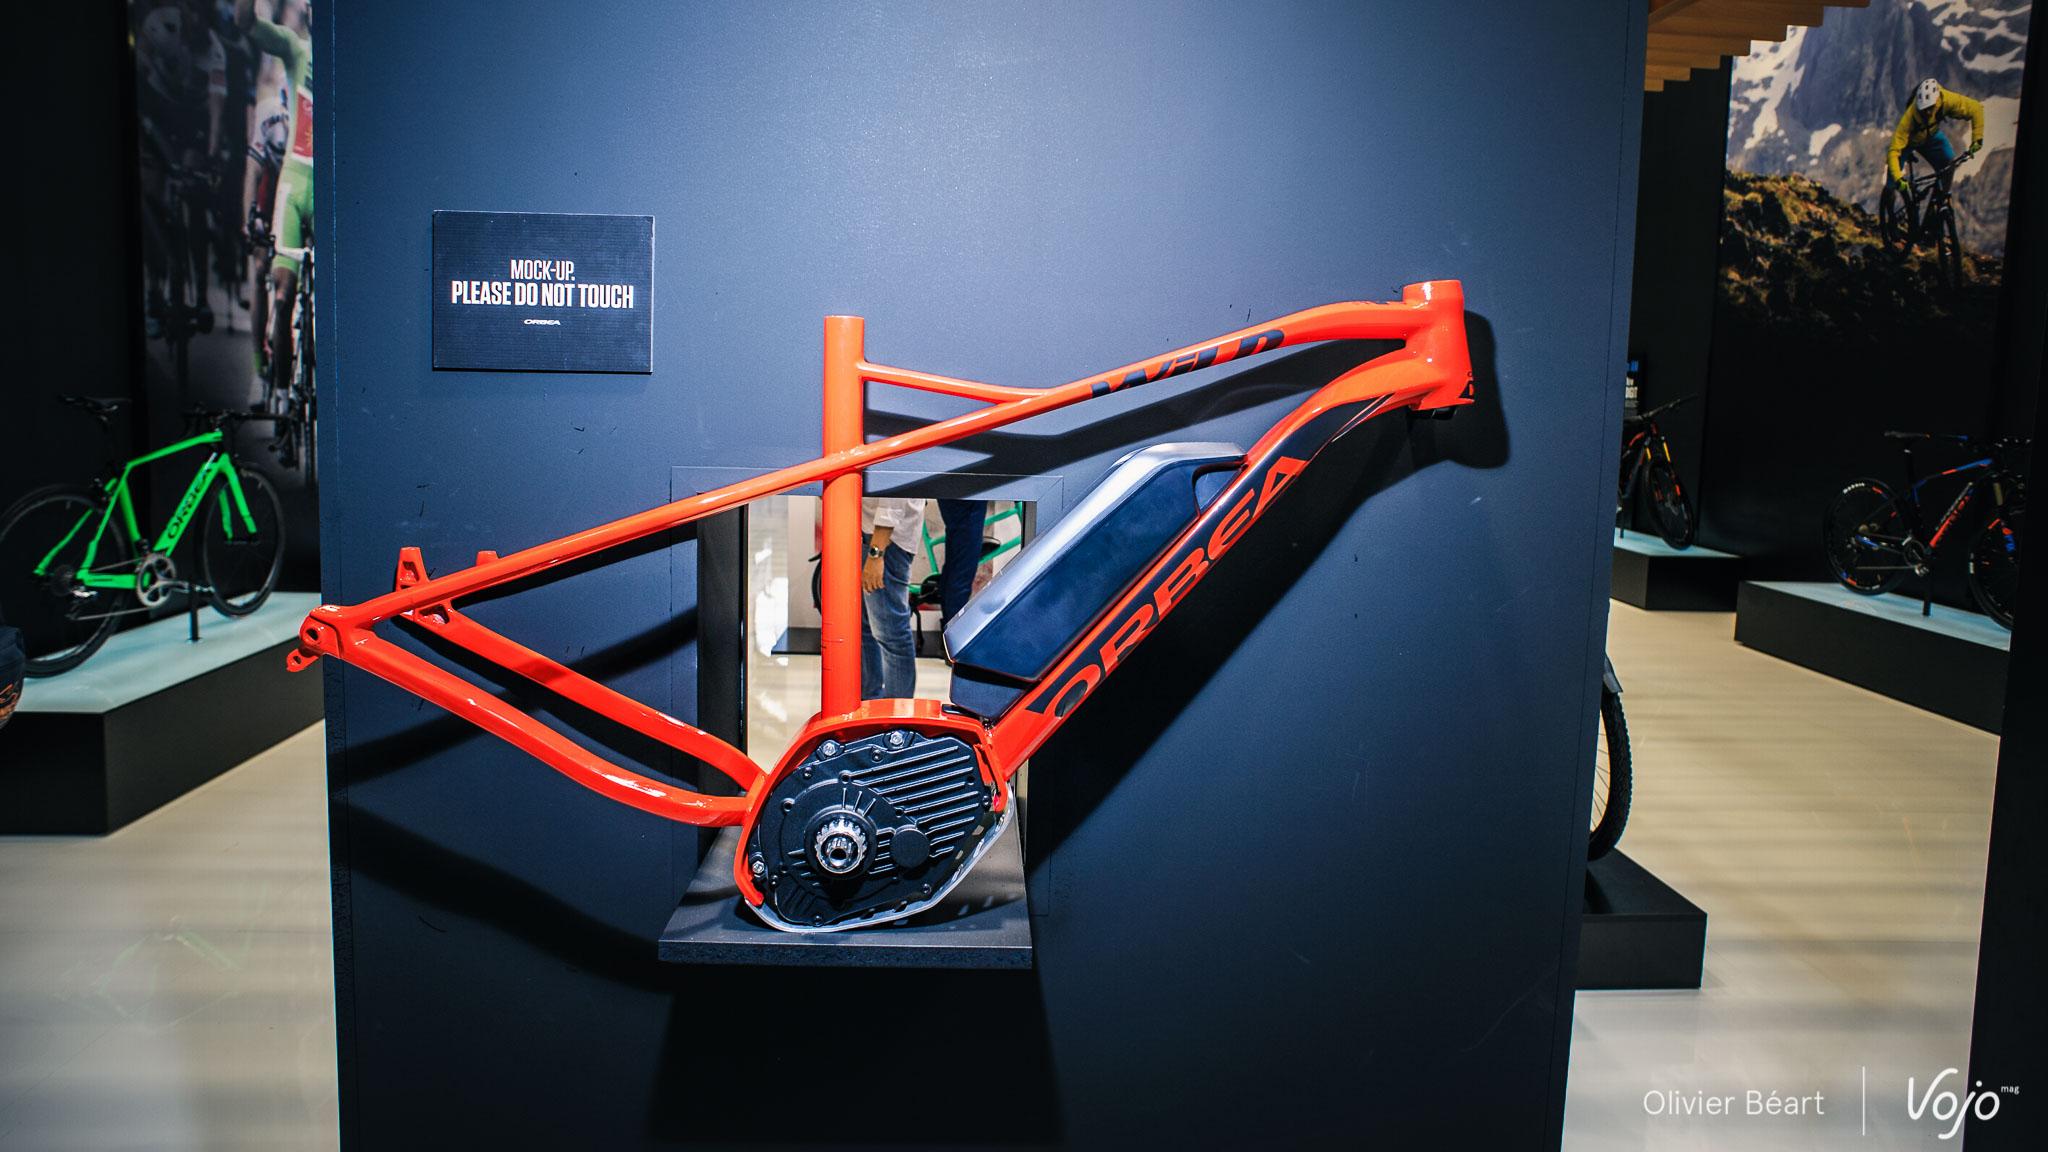 Orbea_Keram_E-Bike_Copyright_OBeart_VojoMag-1